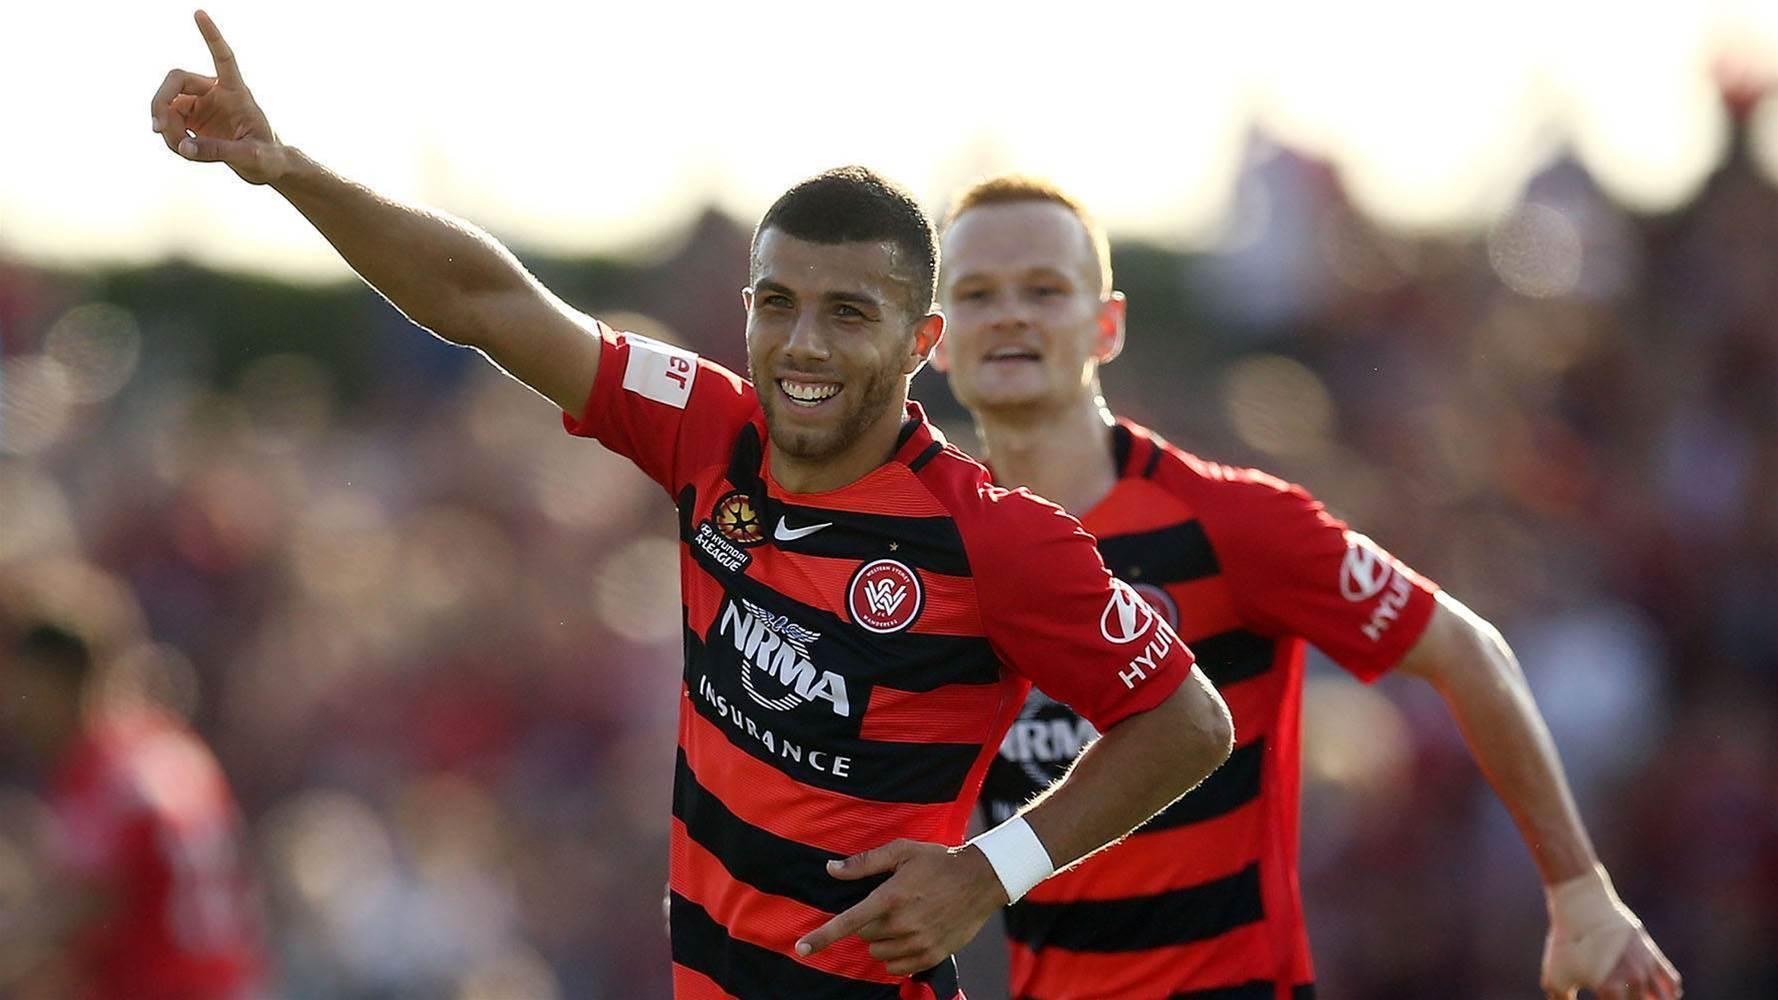 Wanderers thrash Roar in Gold Coast friendly